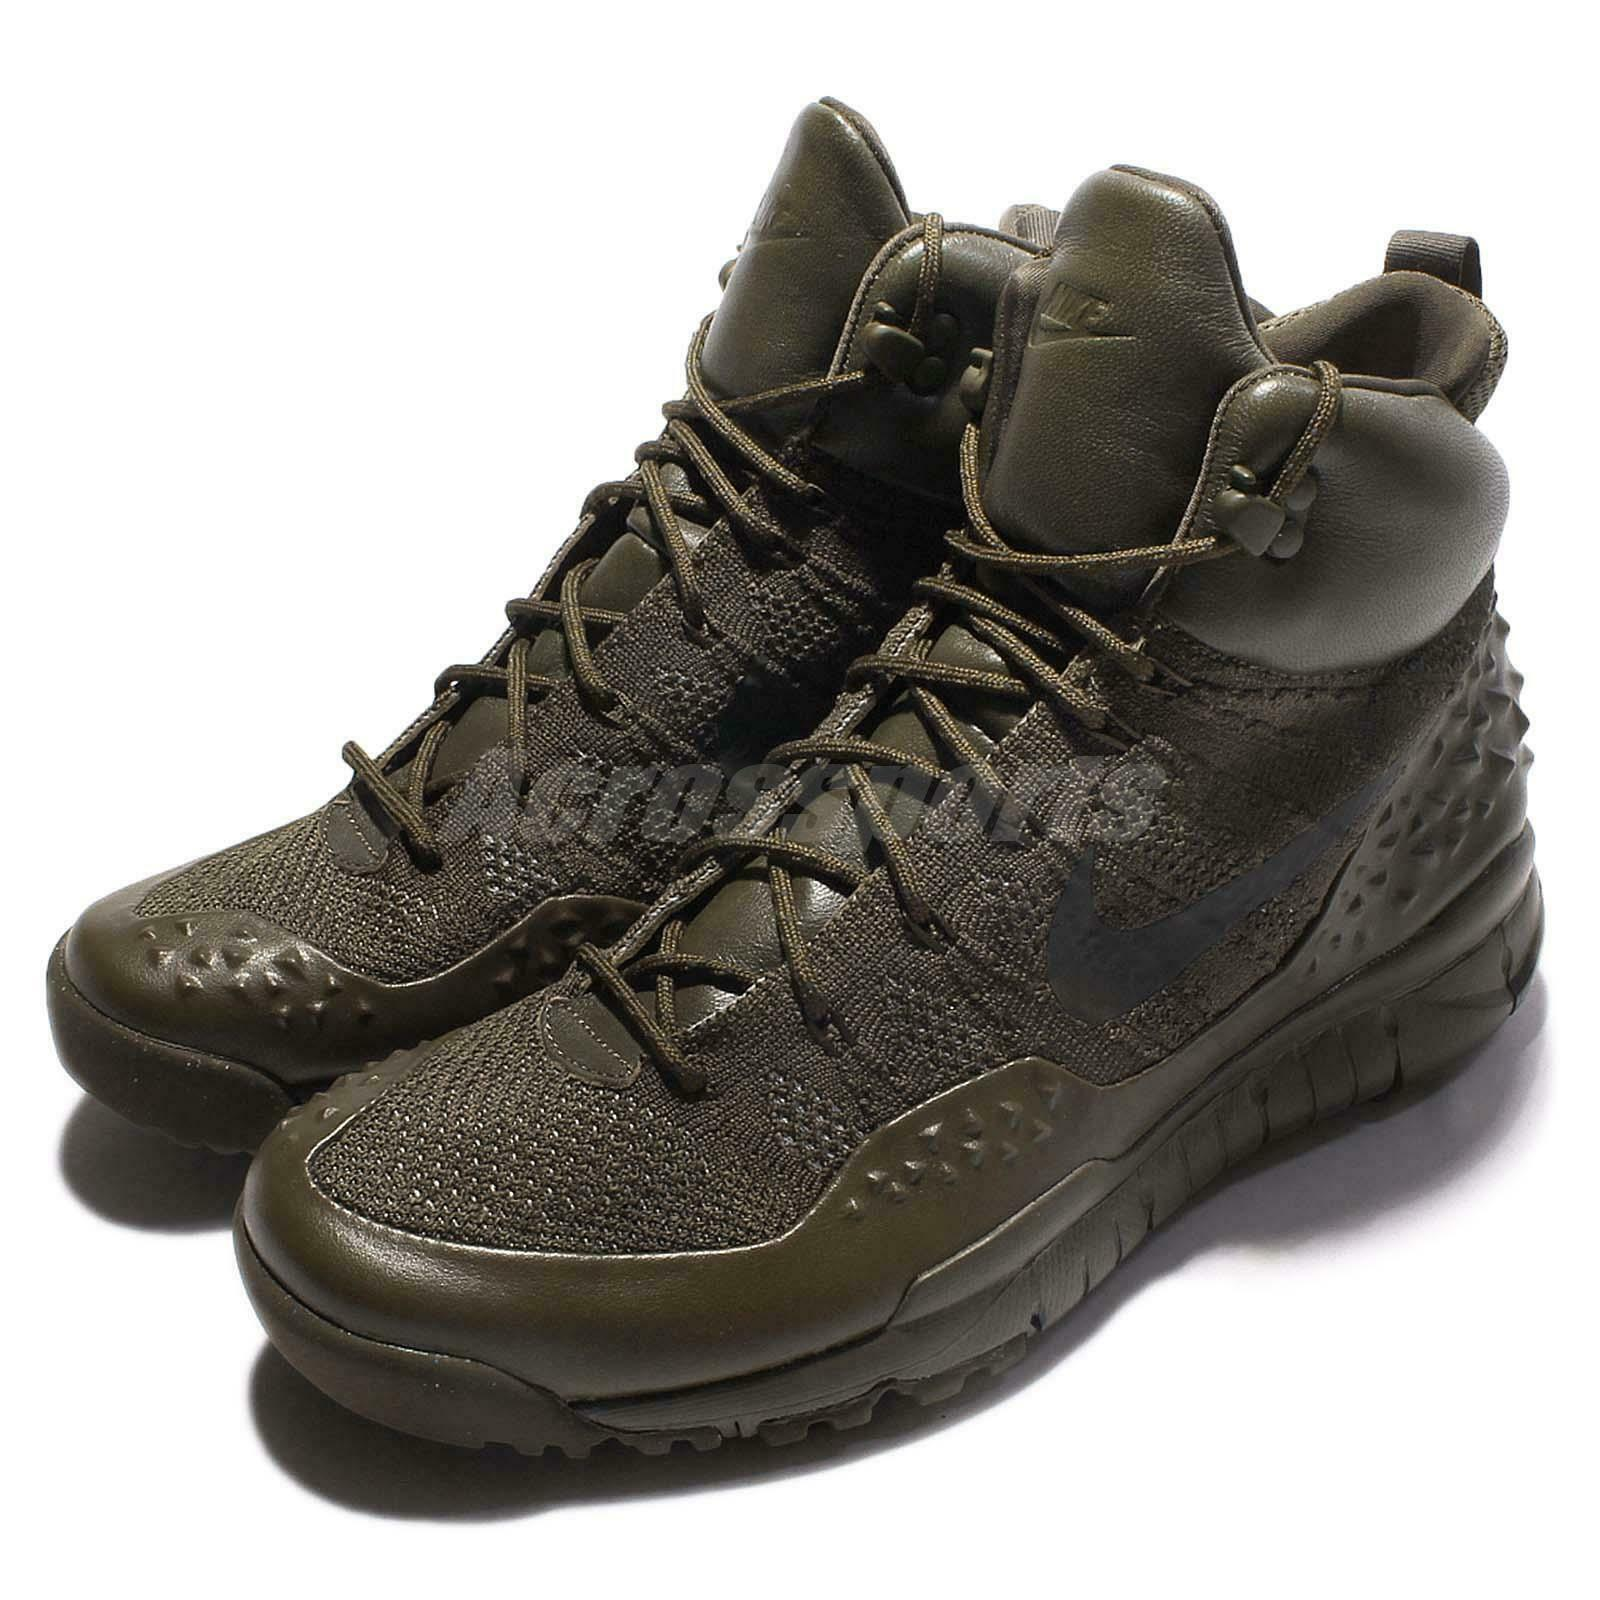 Nike Lupinek Flyknit Cargo Khaki ACG Men Sneakerboots Outdoors Outdoors Outdoors shoes 862505-300 d20505